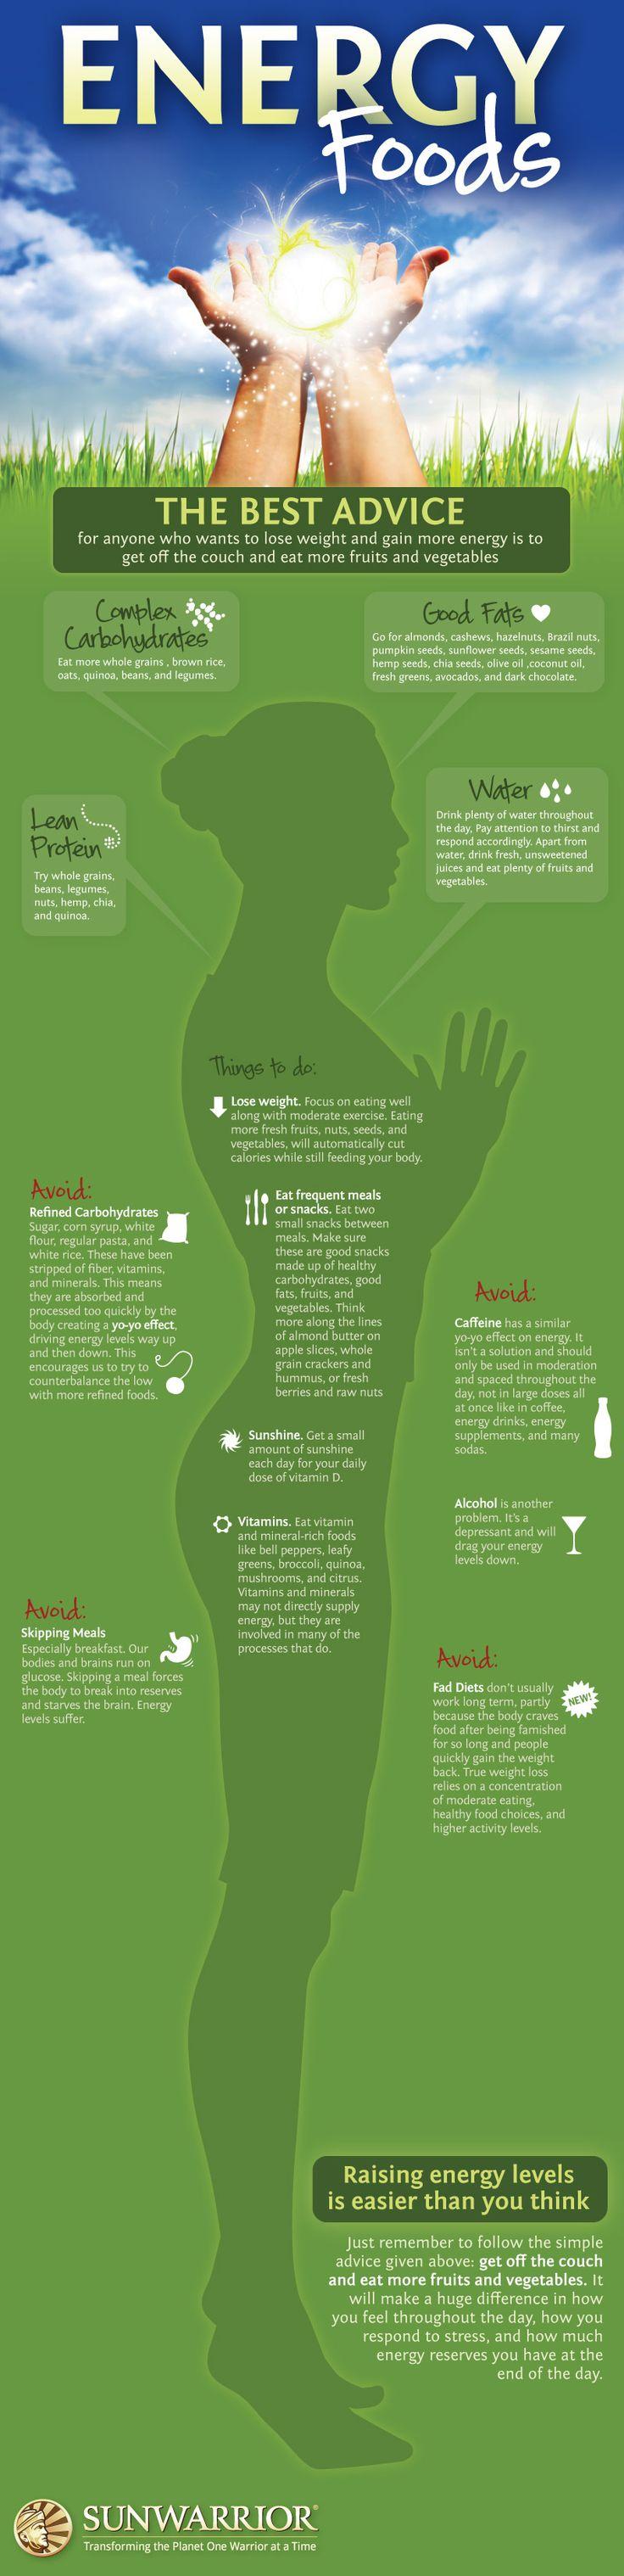 Energy #Foods #Infographic